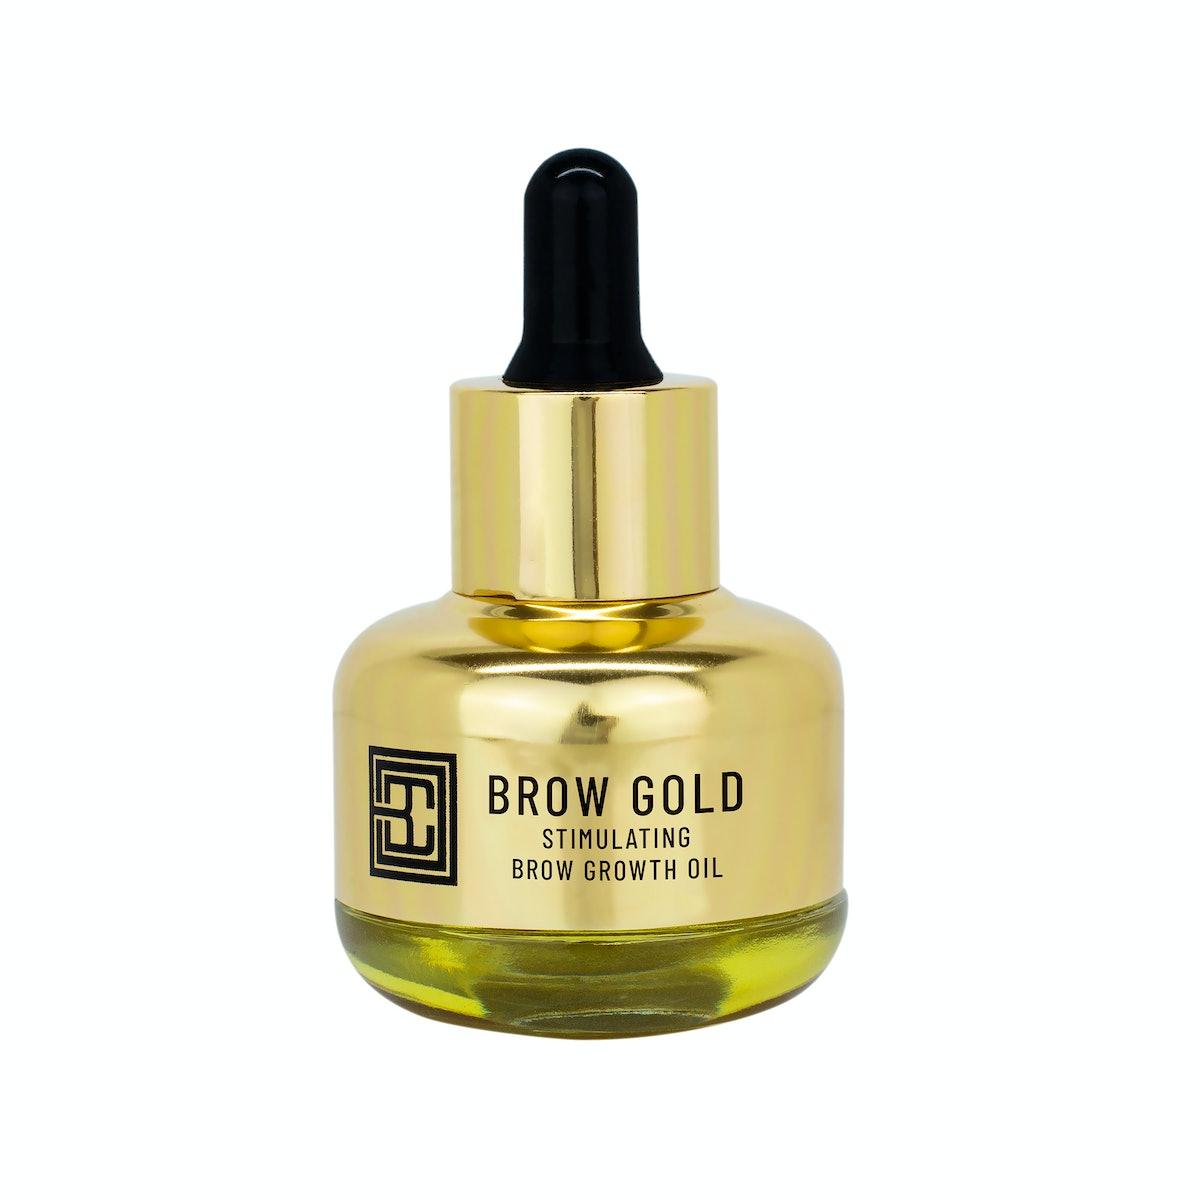 Brow Gold Nourishing Growth Oil